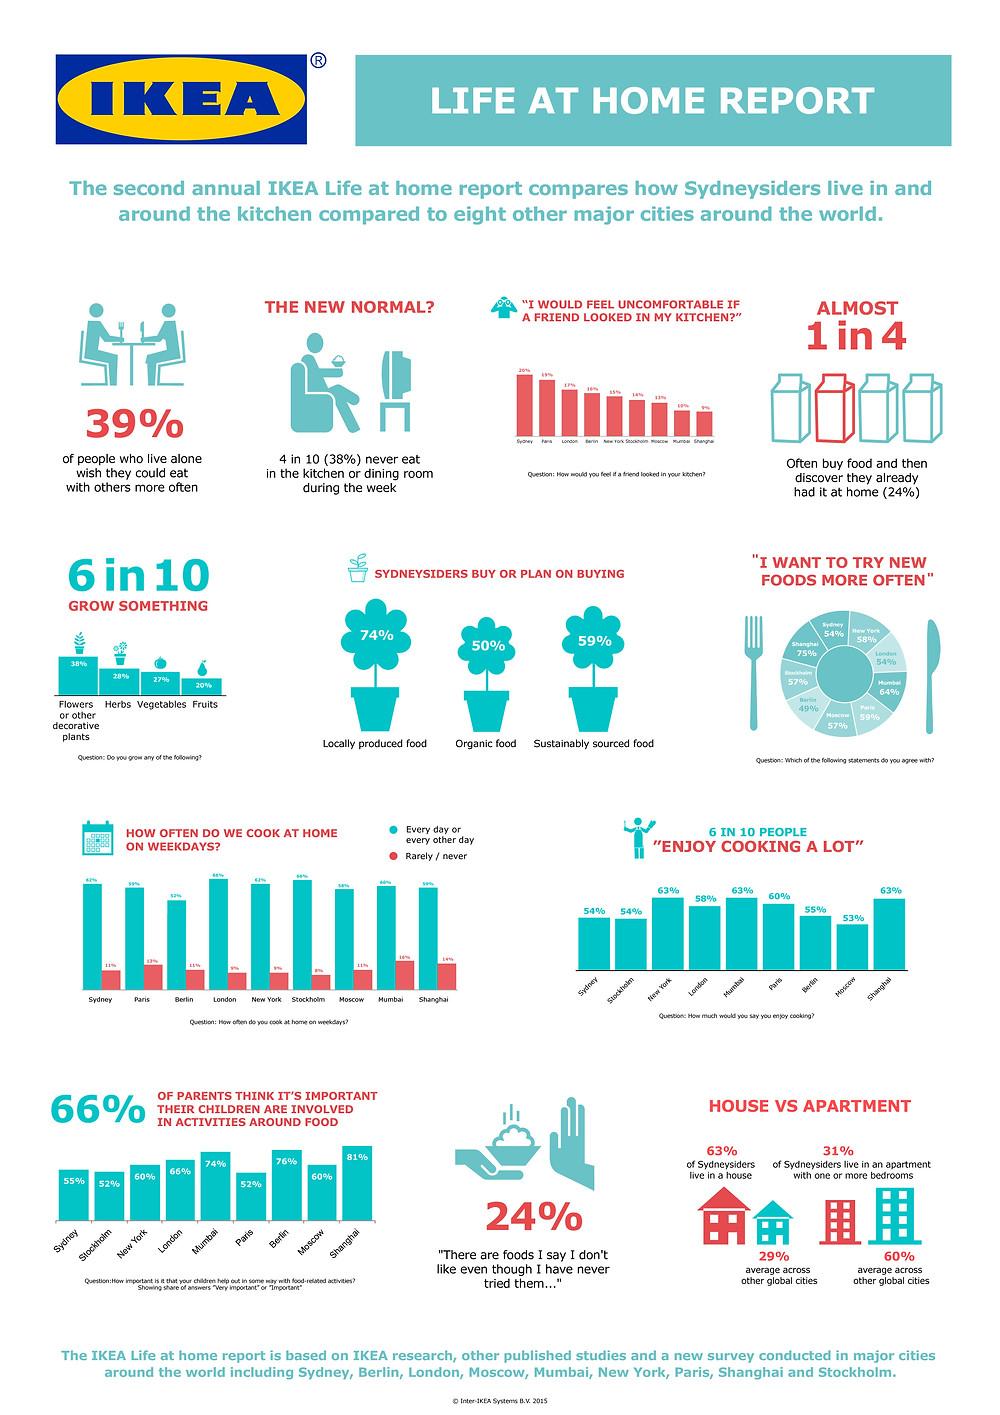 LifeAtHomeReport_Infographic.jpg